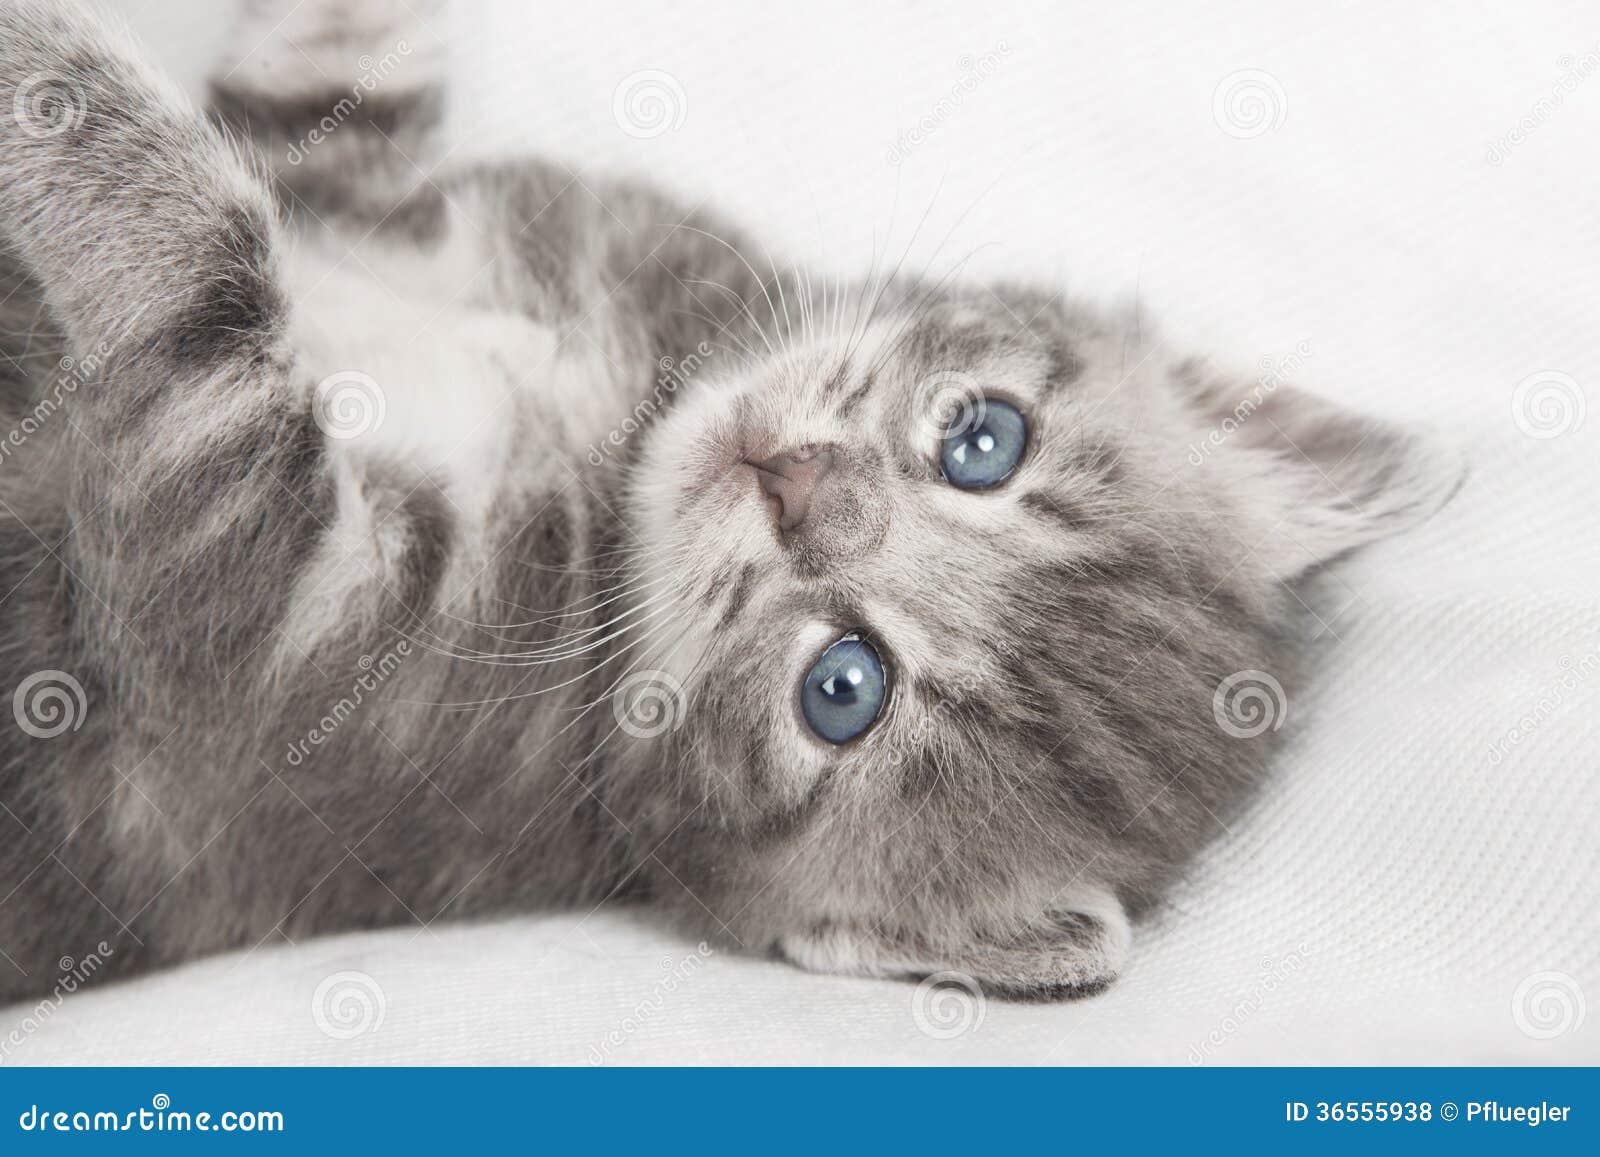 cat litter box price in philippines